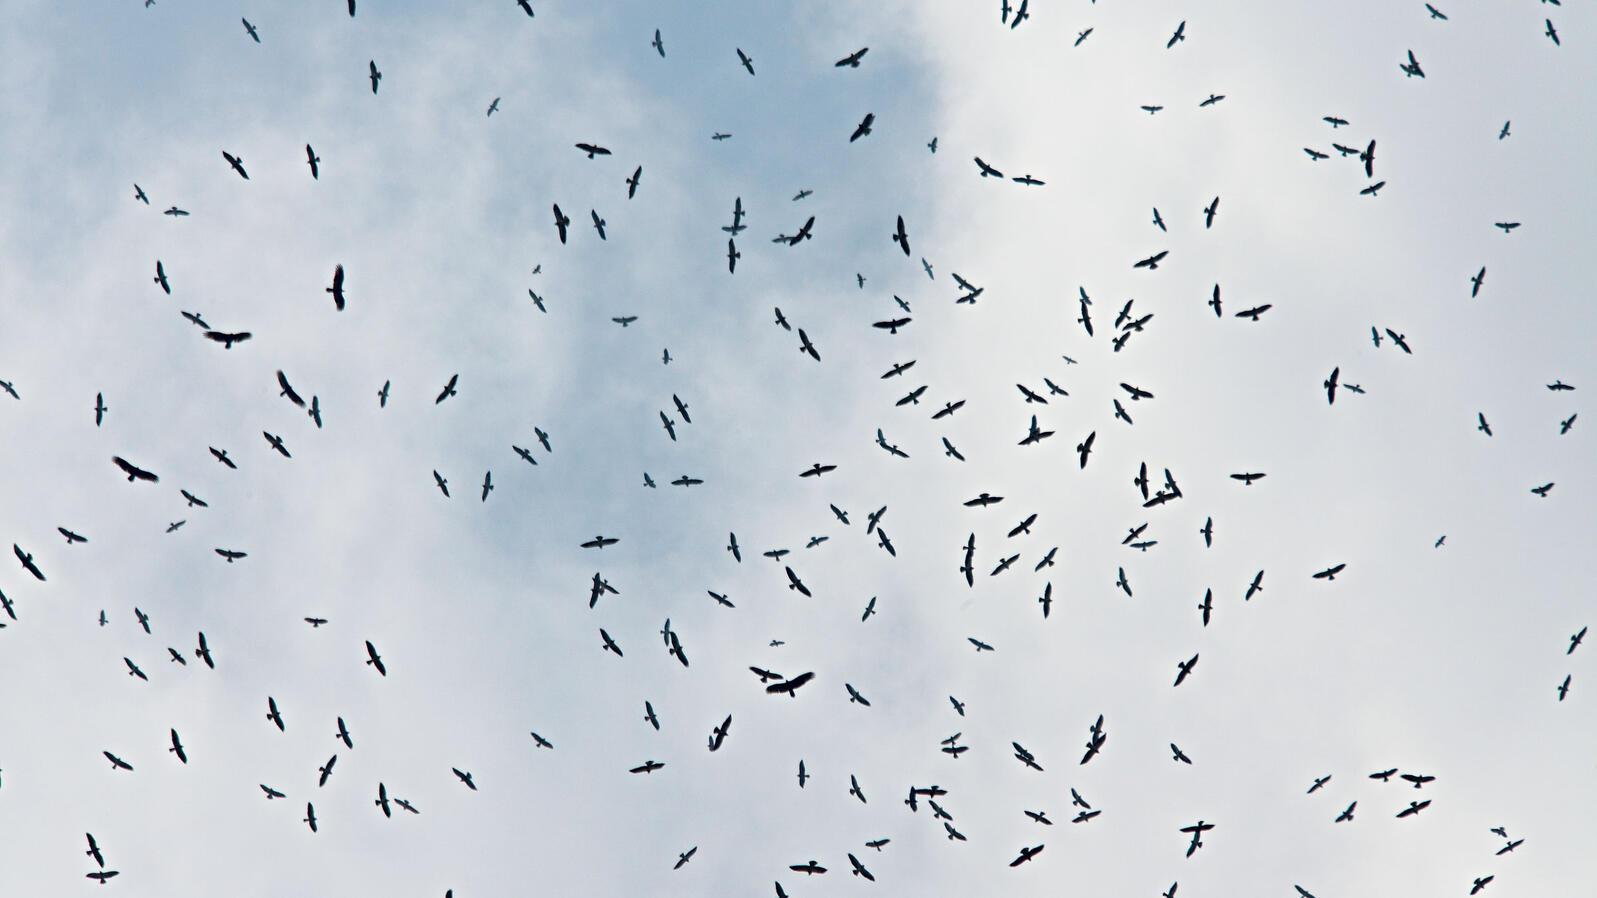 Photograph by Ewan Burns. A kettle of mostly Swainson's hawks over Veracruz as birders gather at the Hotel Bienvenido. Photograph by Ewan Burns.